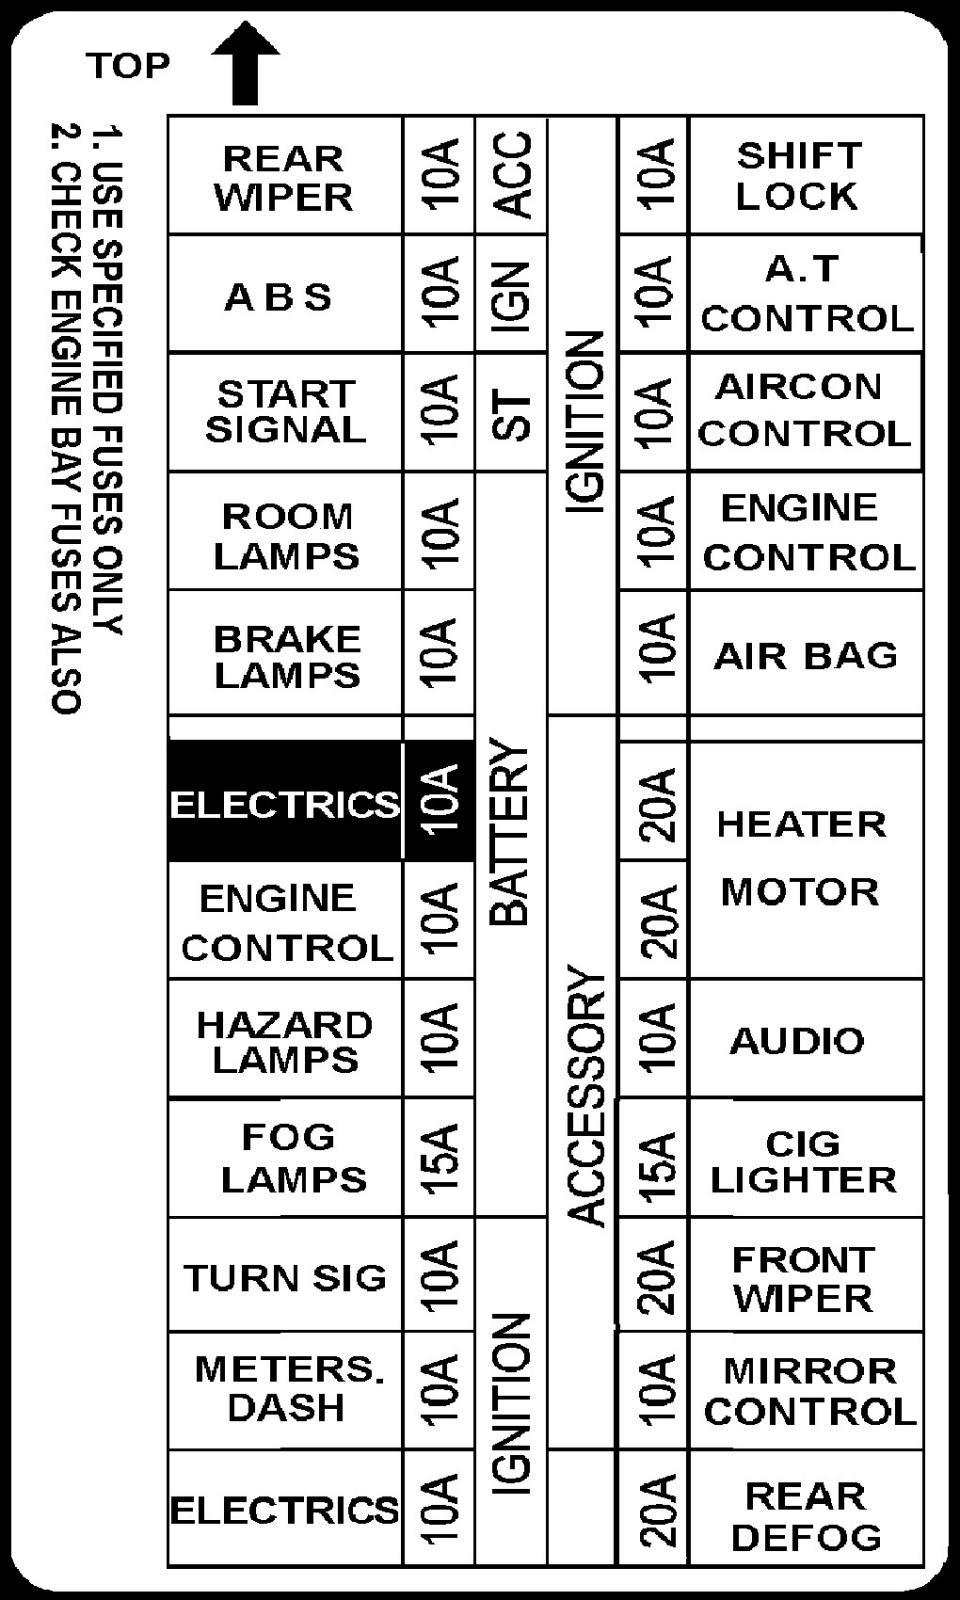 skyline r33 gtst wiring diagram 1997 ford f250 headlight fh schwabenschamanen de nissan gtr fuse box hub rh 19 6 dw germany